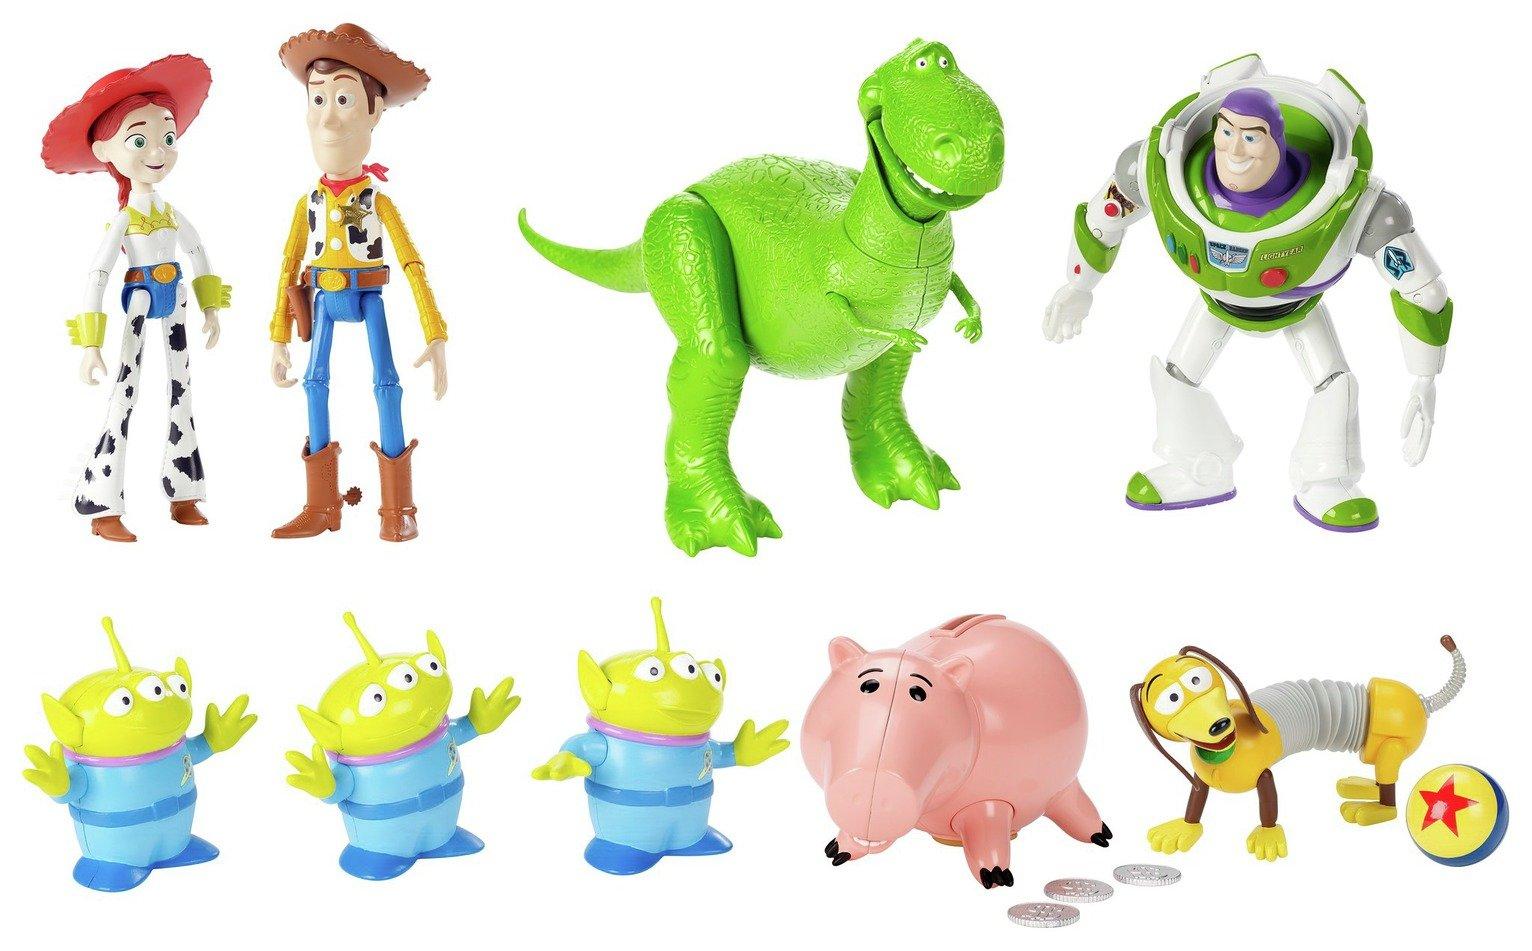 Disney Pixar Toy Story 7inch Figure Assortment